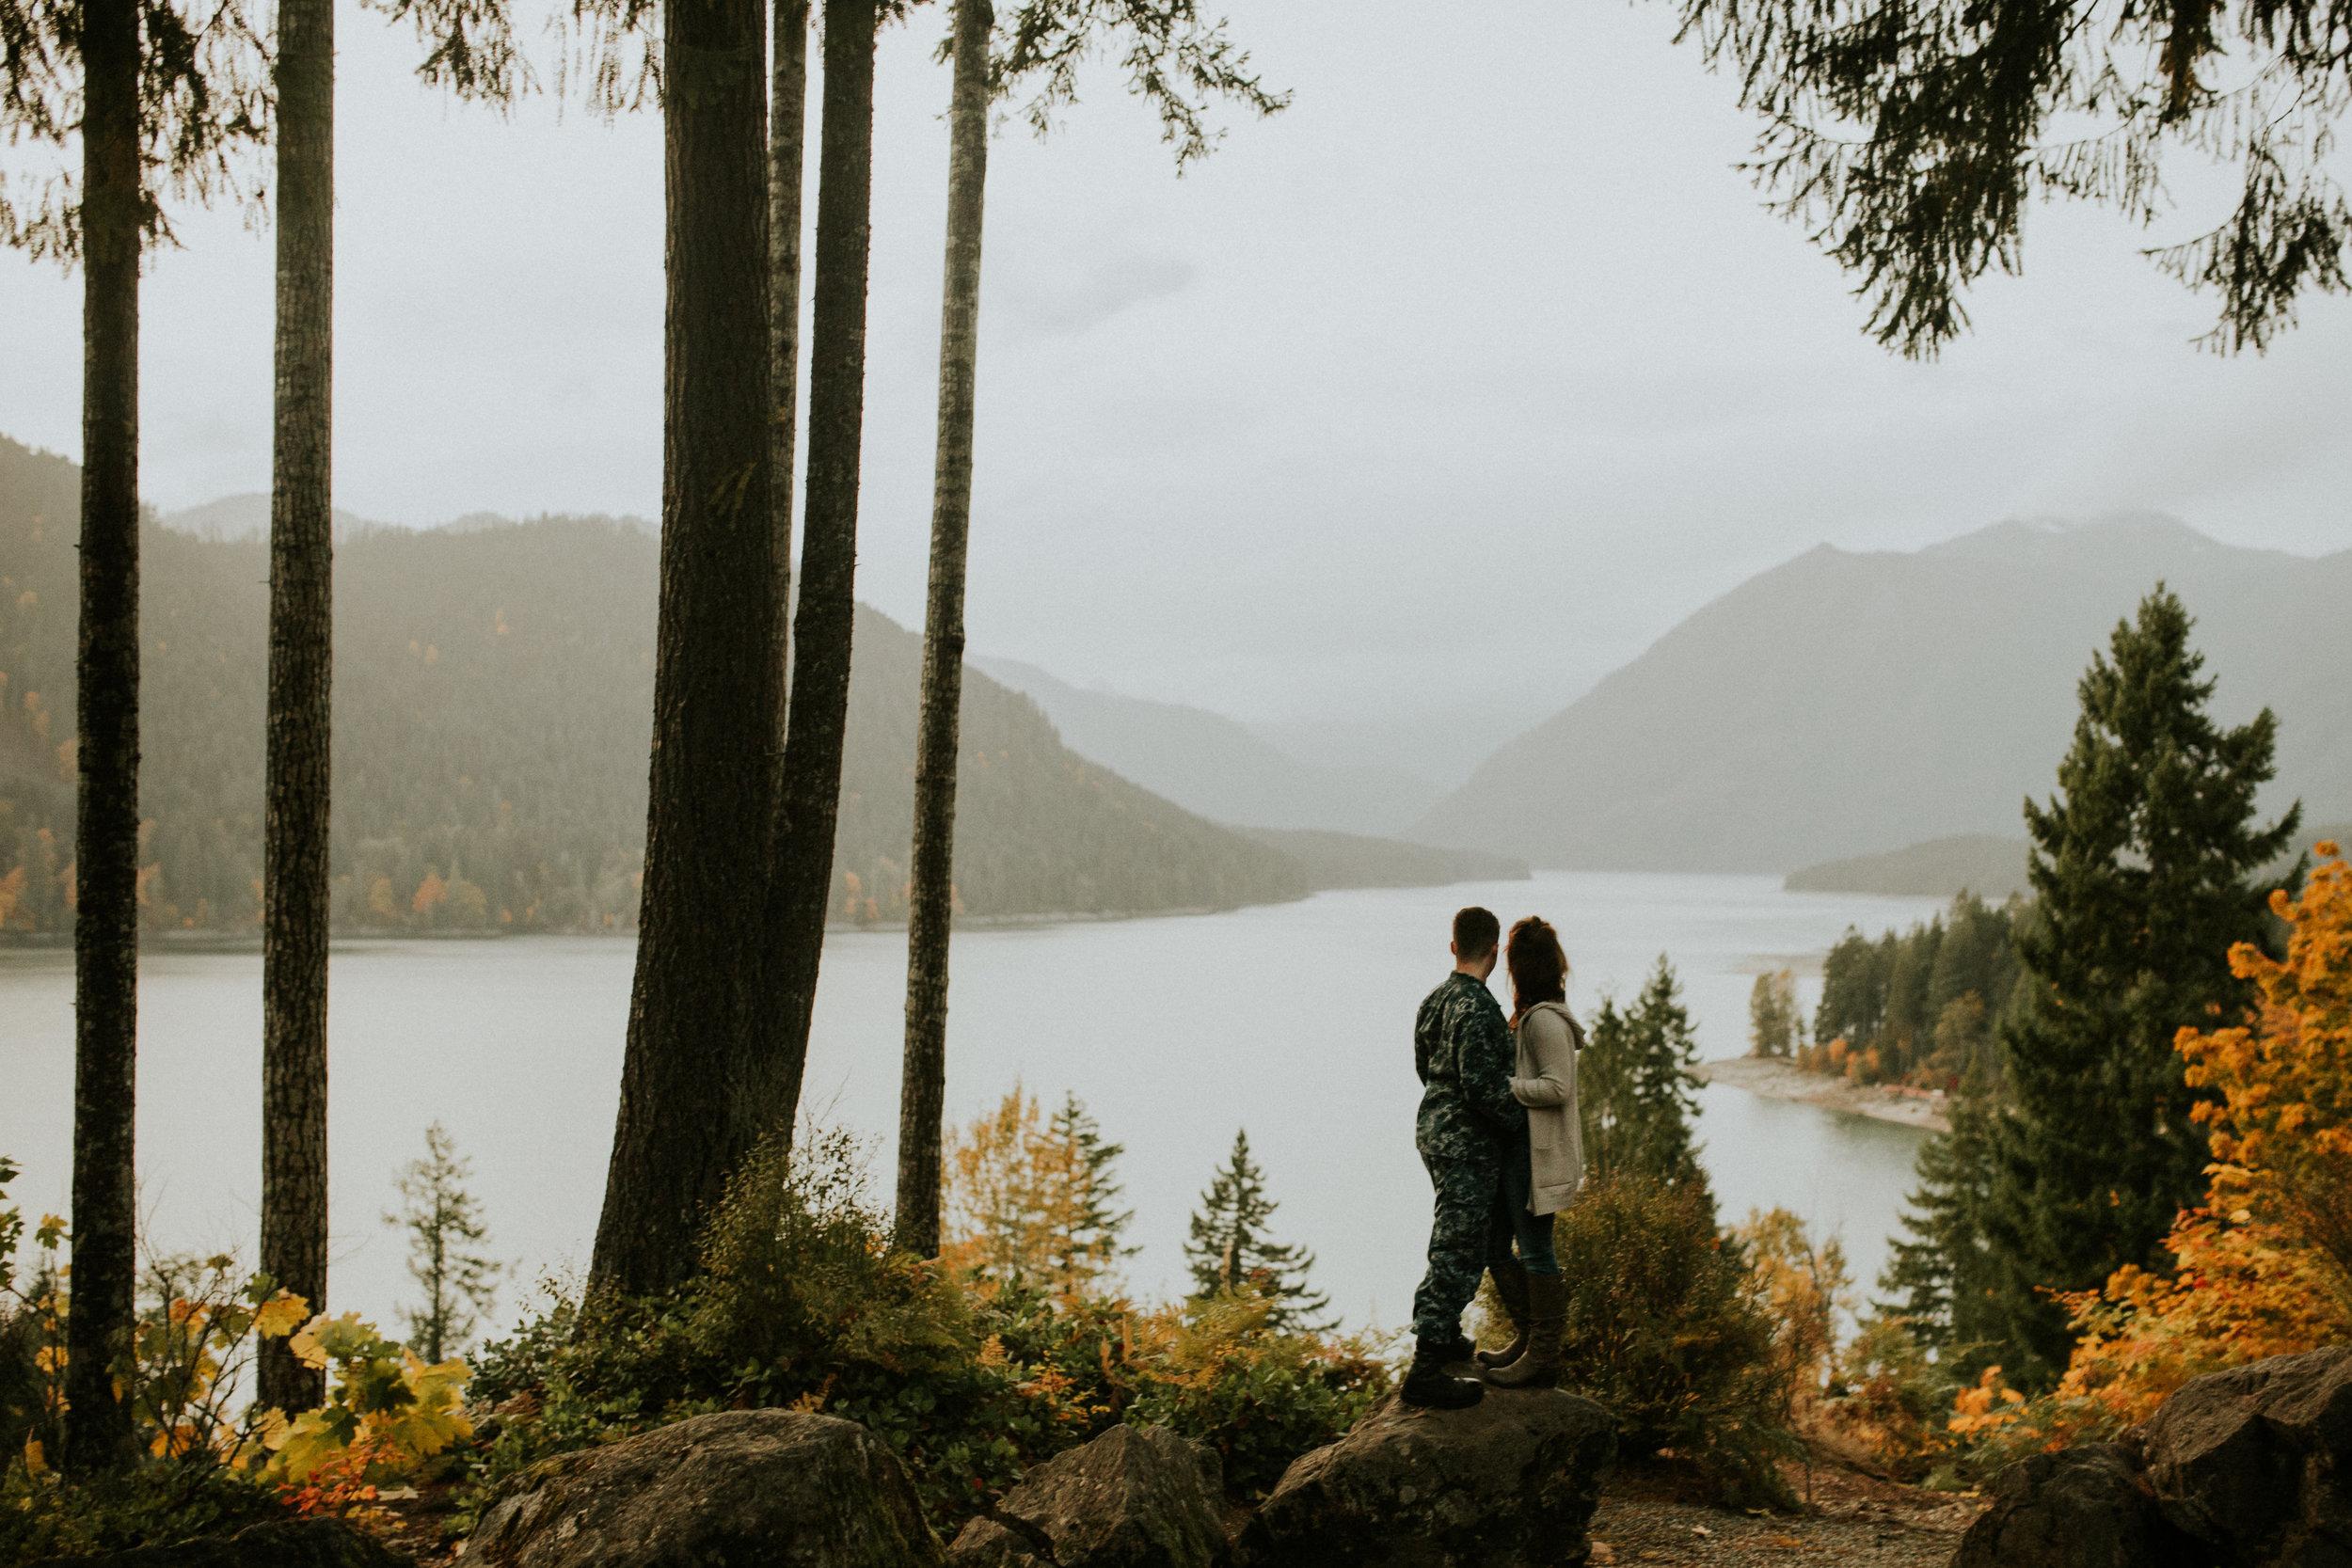 Lake-Cushman-Adventure-Engagement-photographer-breeanna-lasher-85.jpg